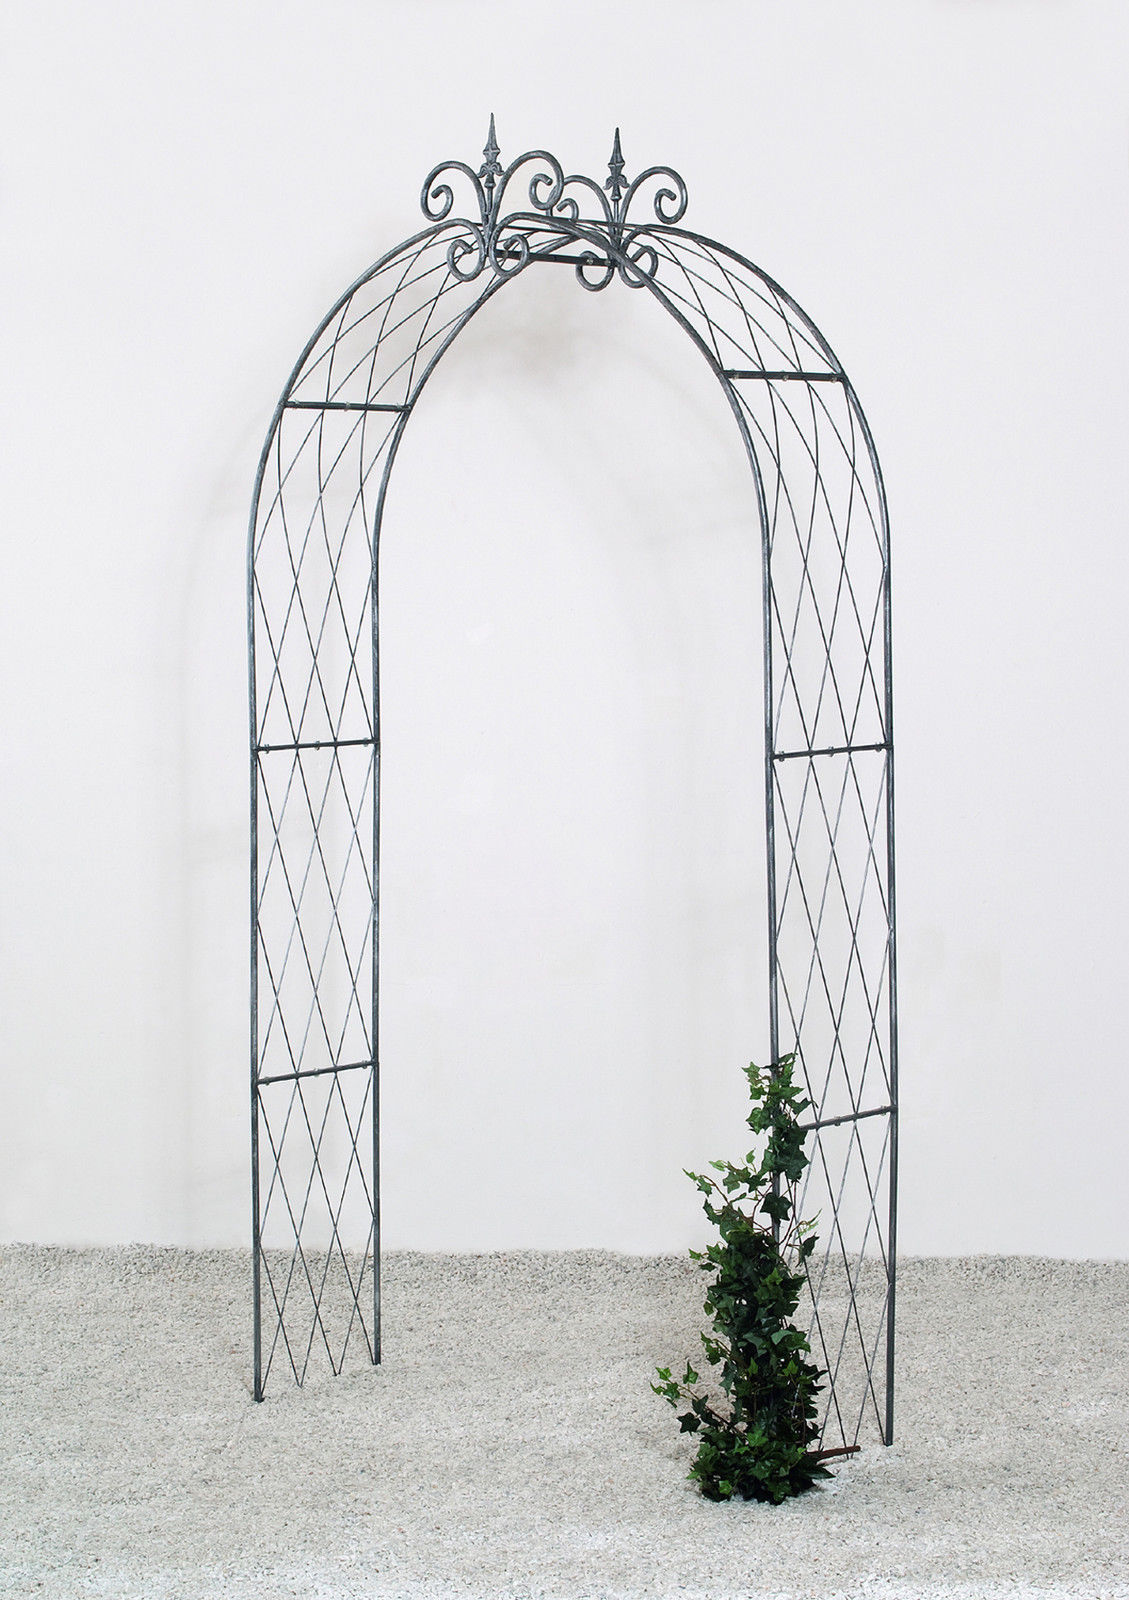 rosenbogen laubengang rankhilfe pergola leska metall. Black Bedroom Furniture Sets. Home Design Ideas